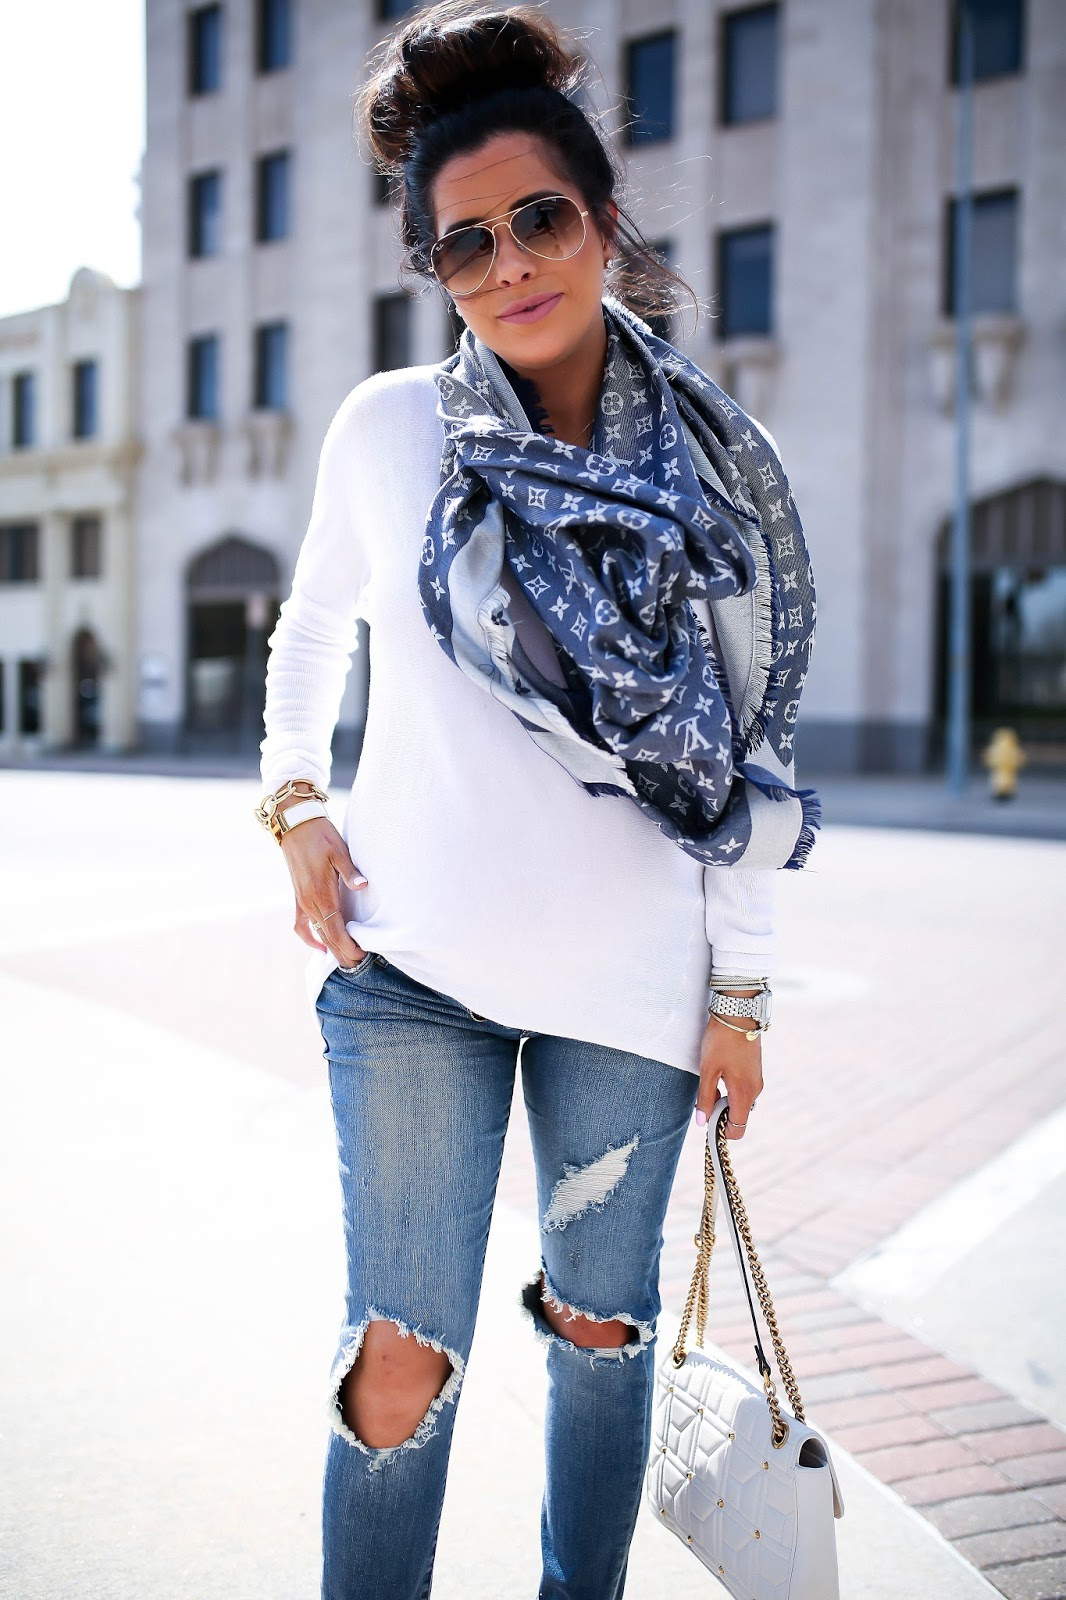 8be1e7cb0f Boyfriend jeans outfit ideas pinterest. 10 Boyfriend Jeans Outfit ...